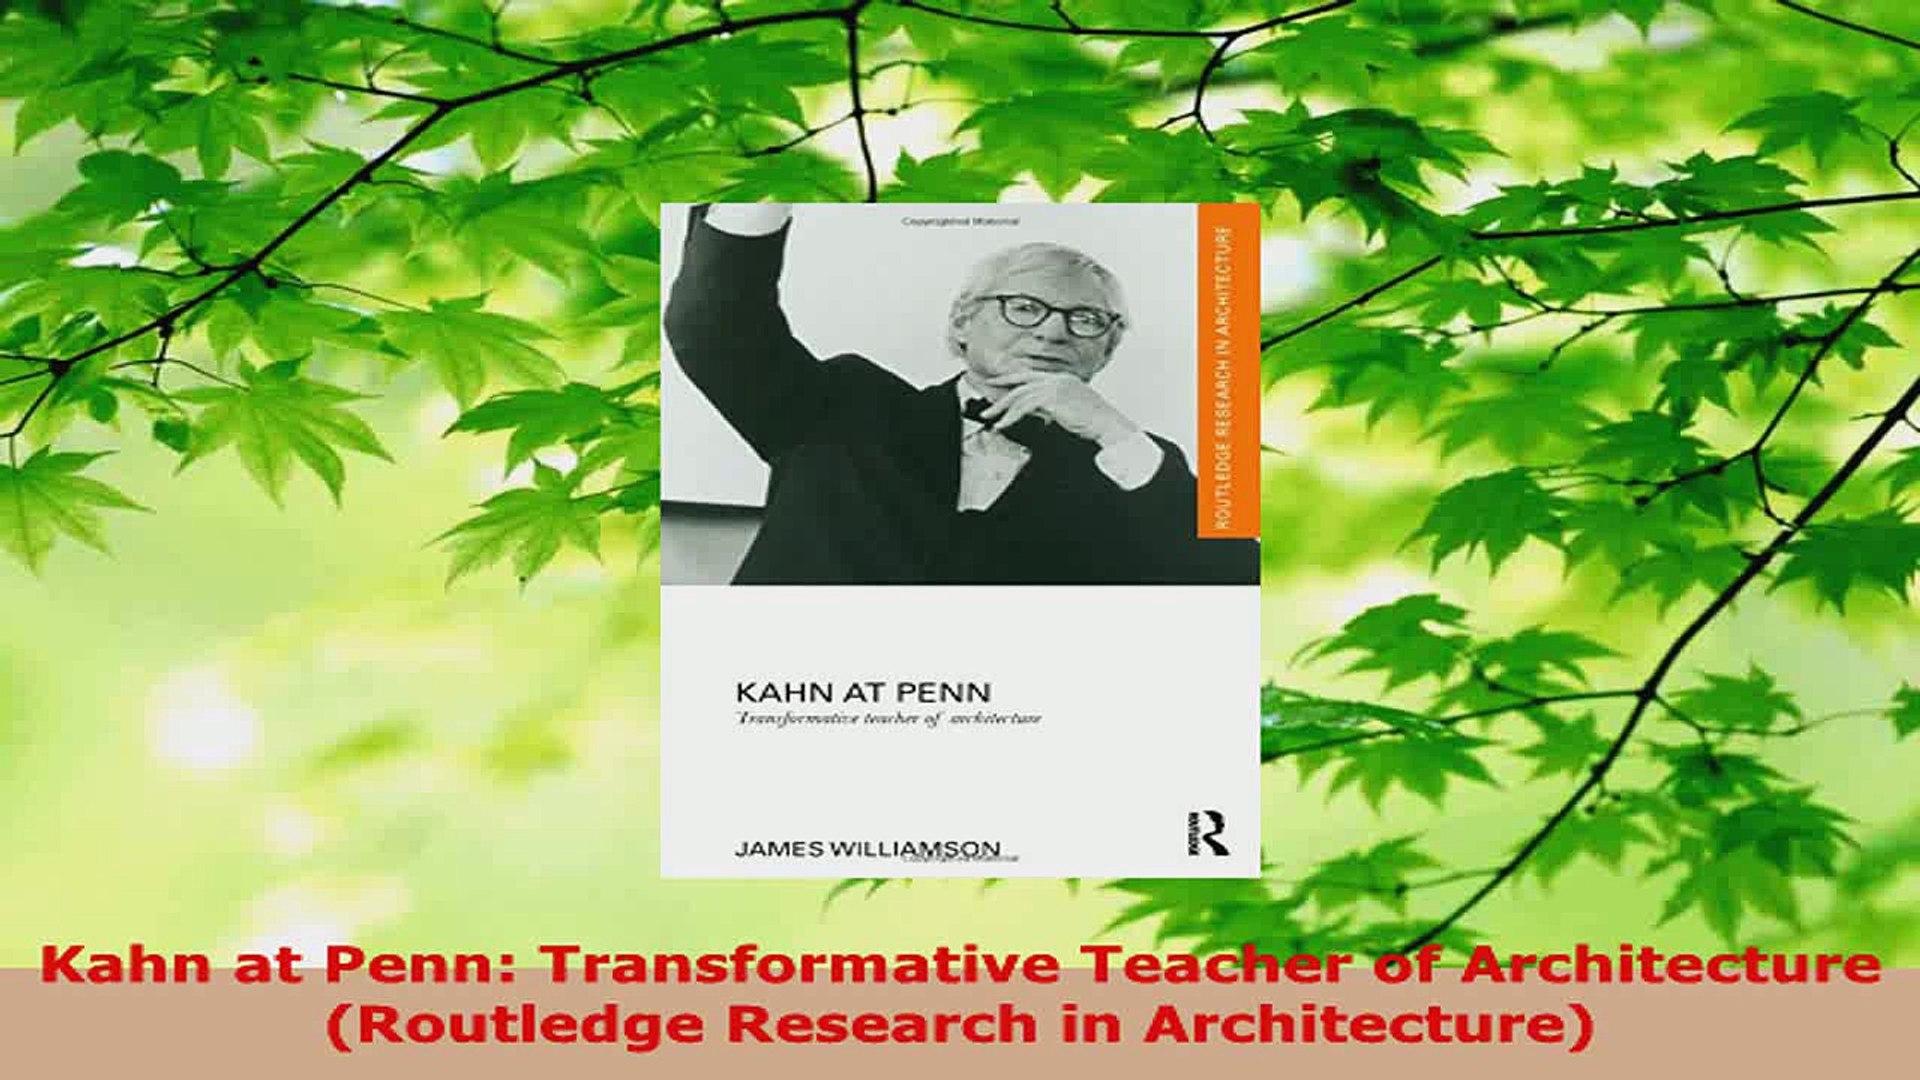 Kahn at Penn Transformative Teacher of Architecture